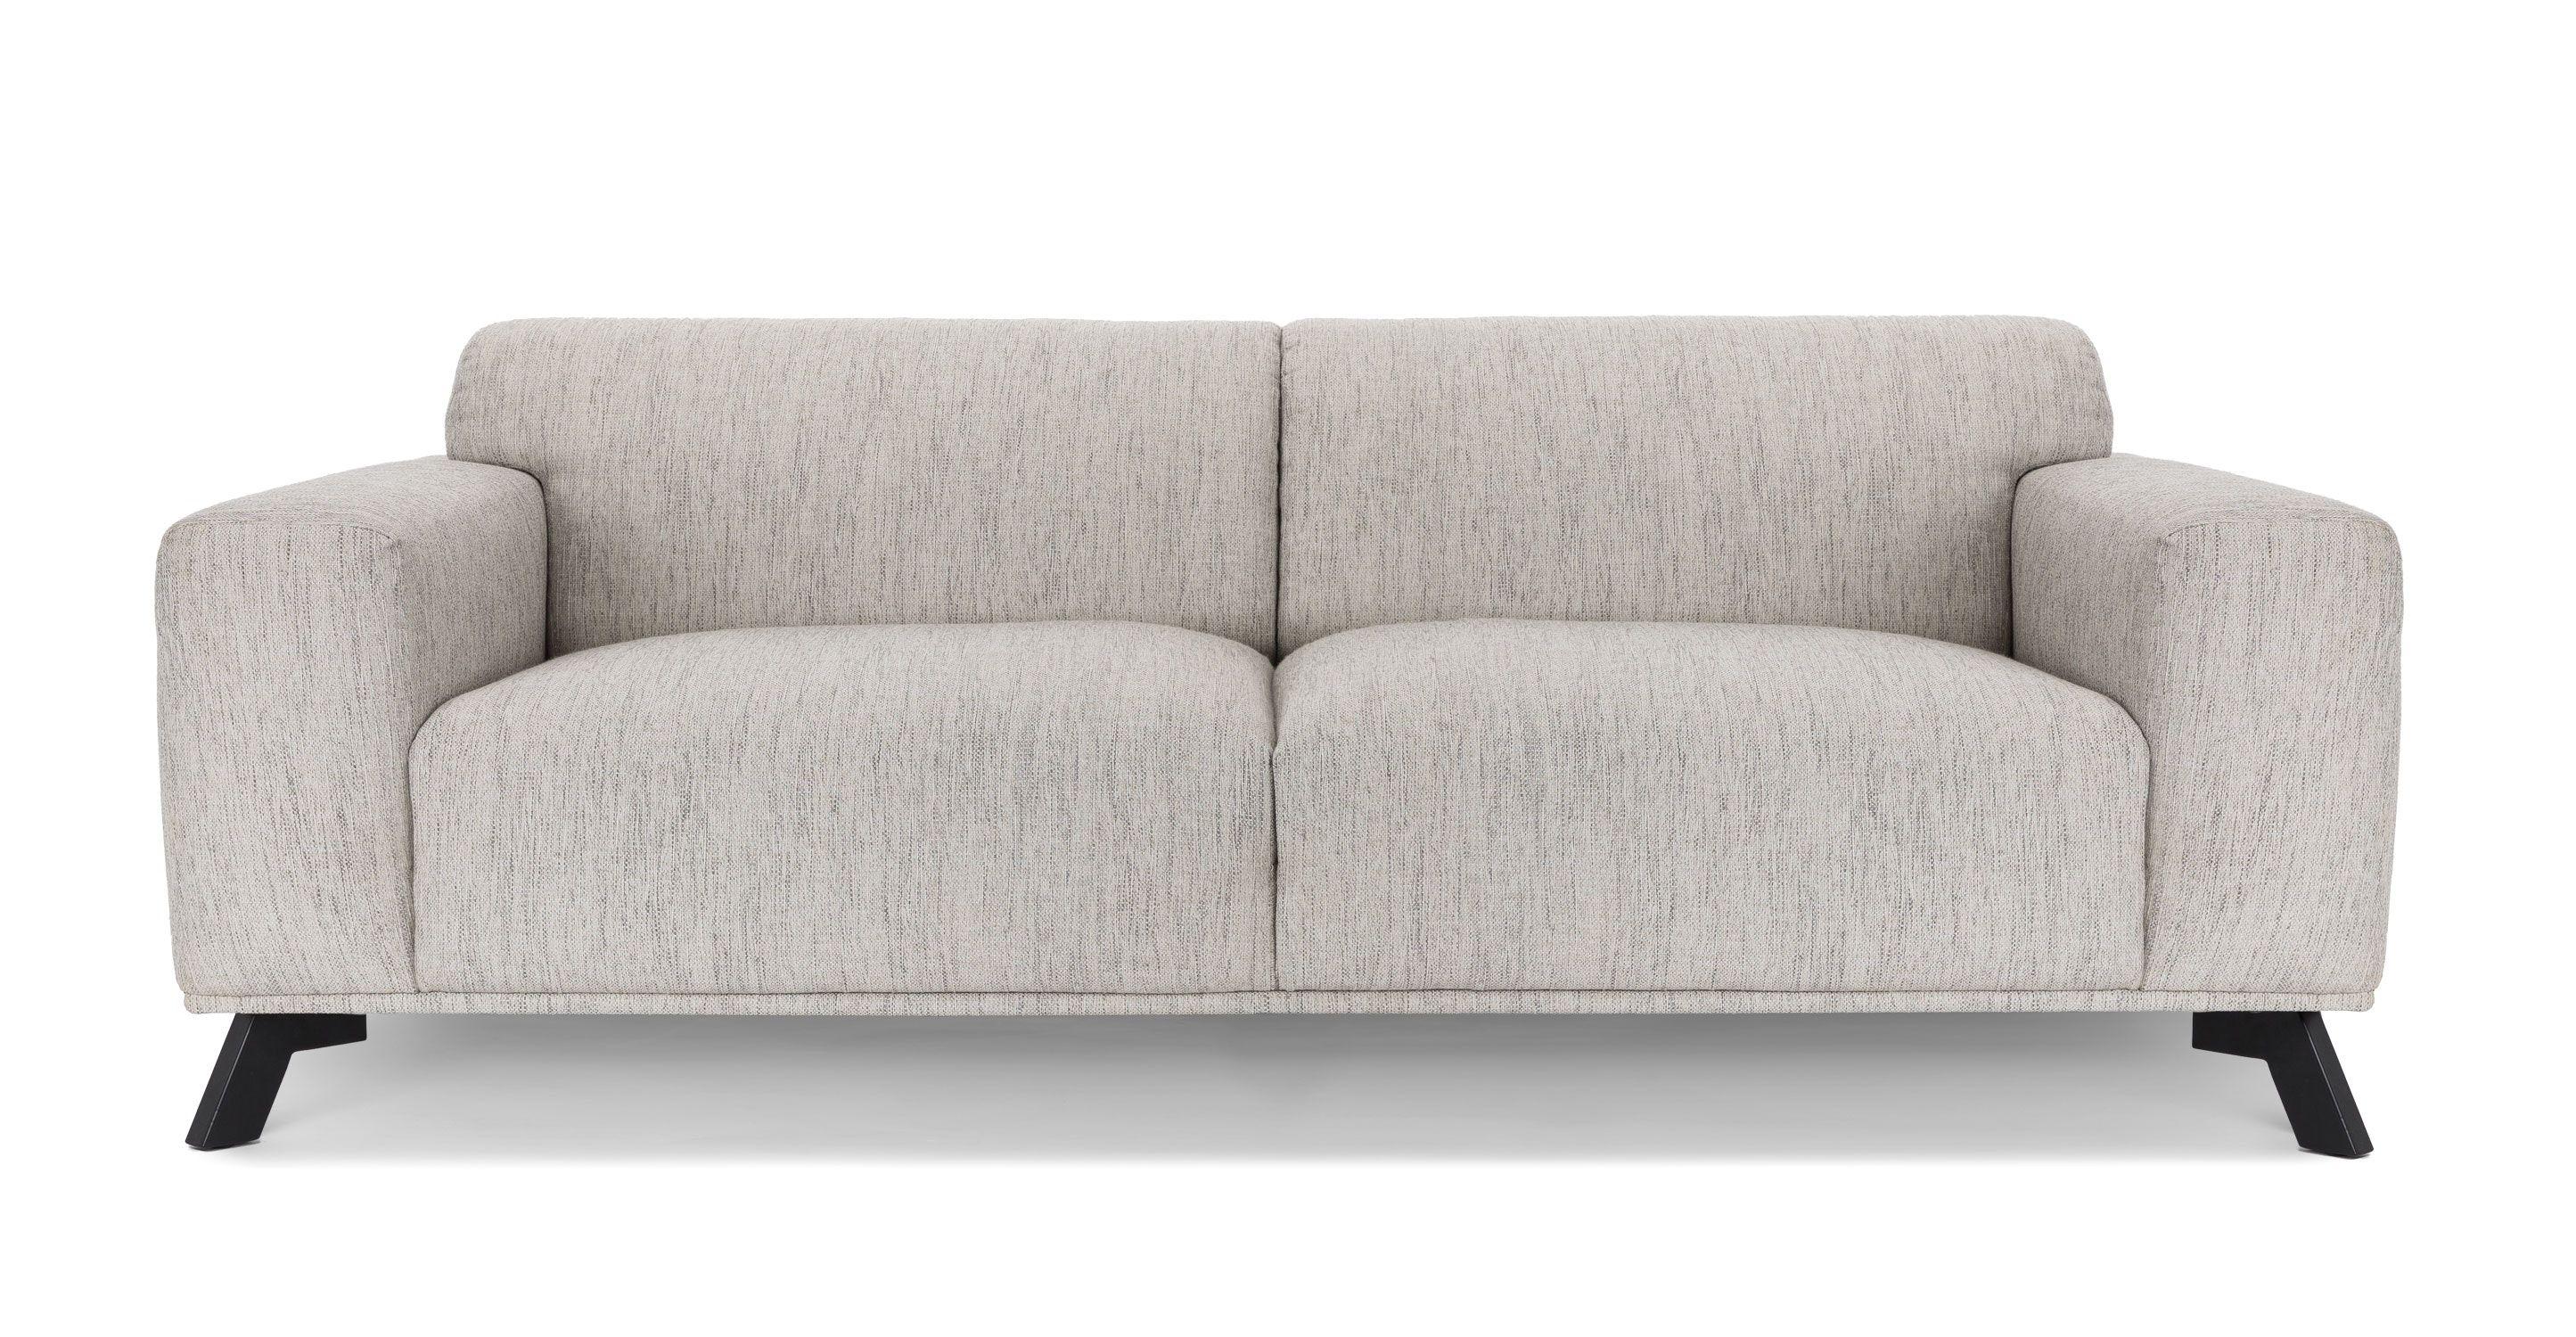 Best Volu Vanilla Cream Sofa Scandinavian Furniture Round 640 x 480